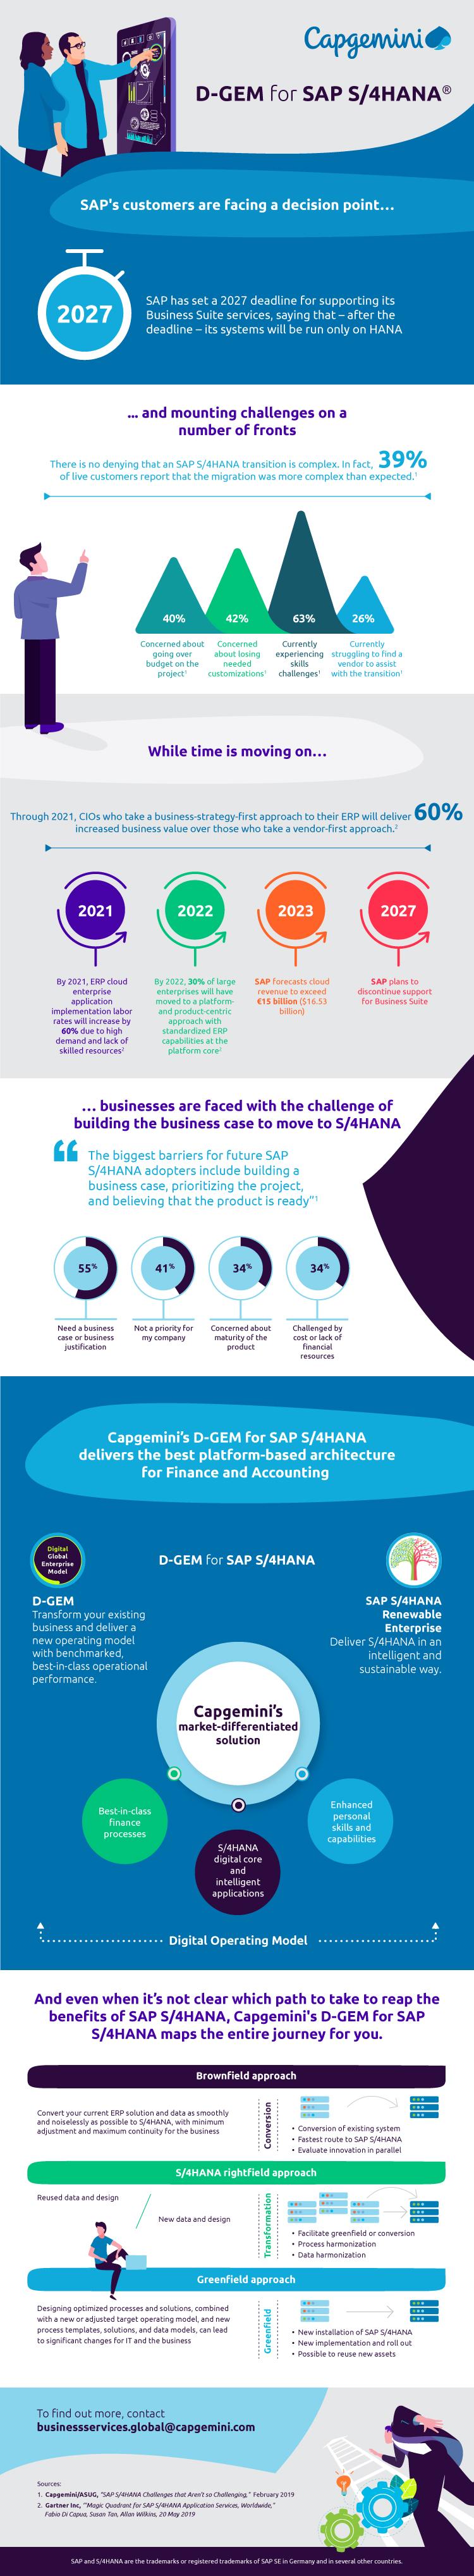 D-GEM for SAP S4HANA® - Infographic